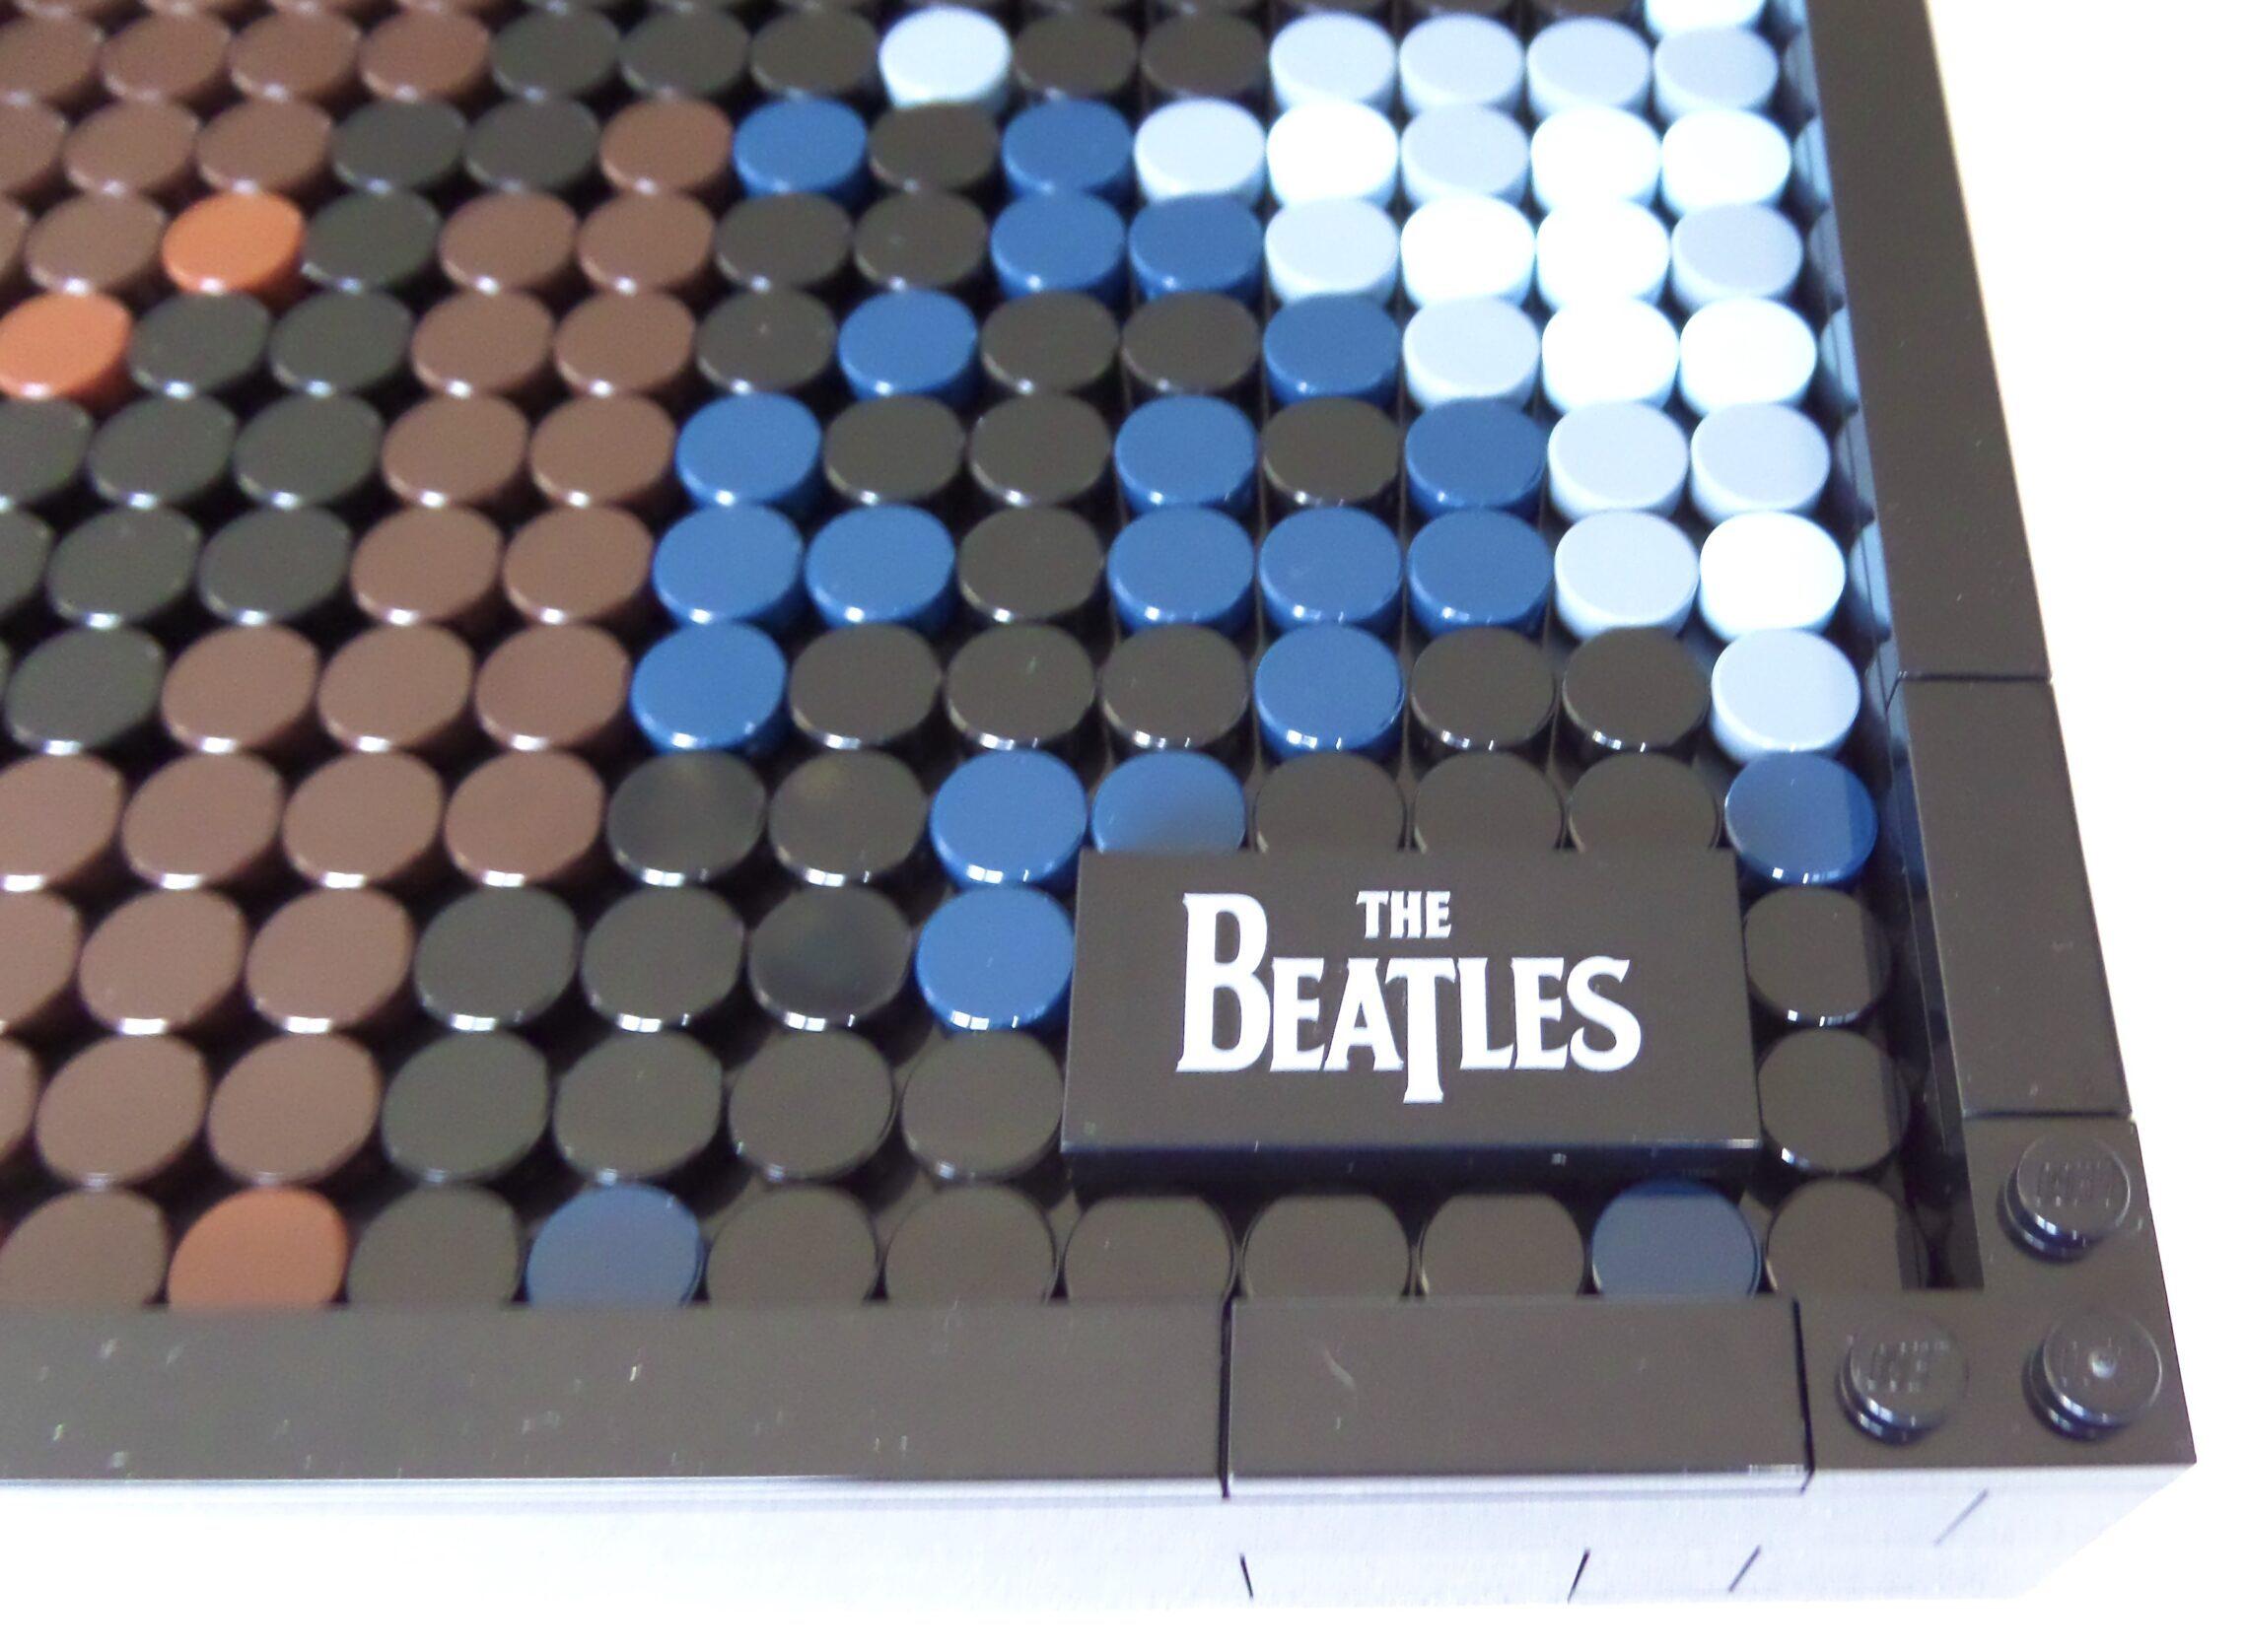 LEGO Art 31198 The Beatles